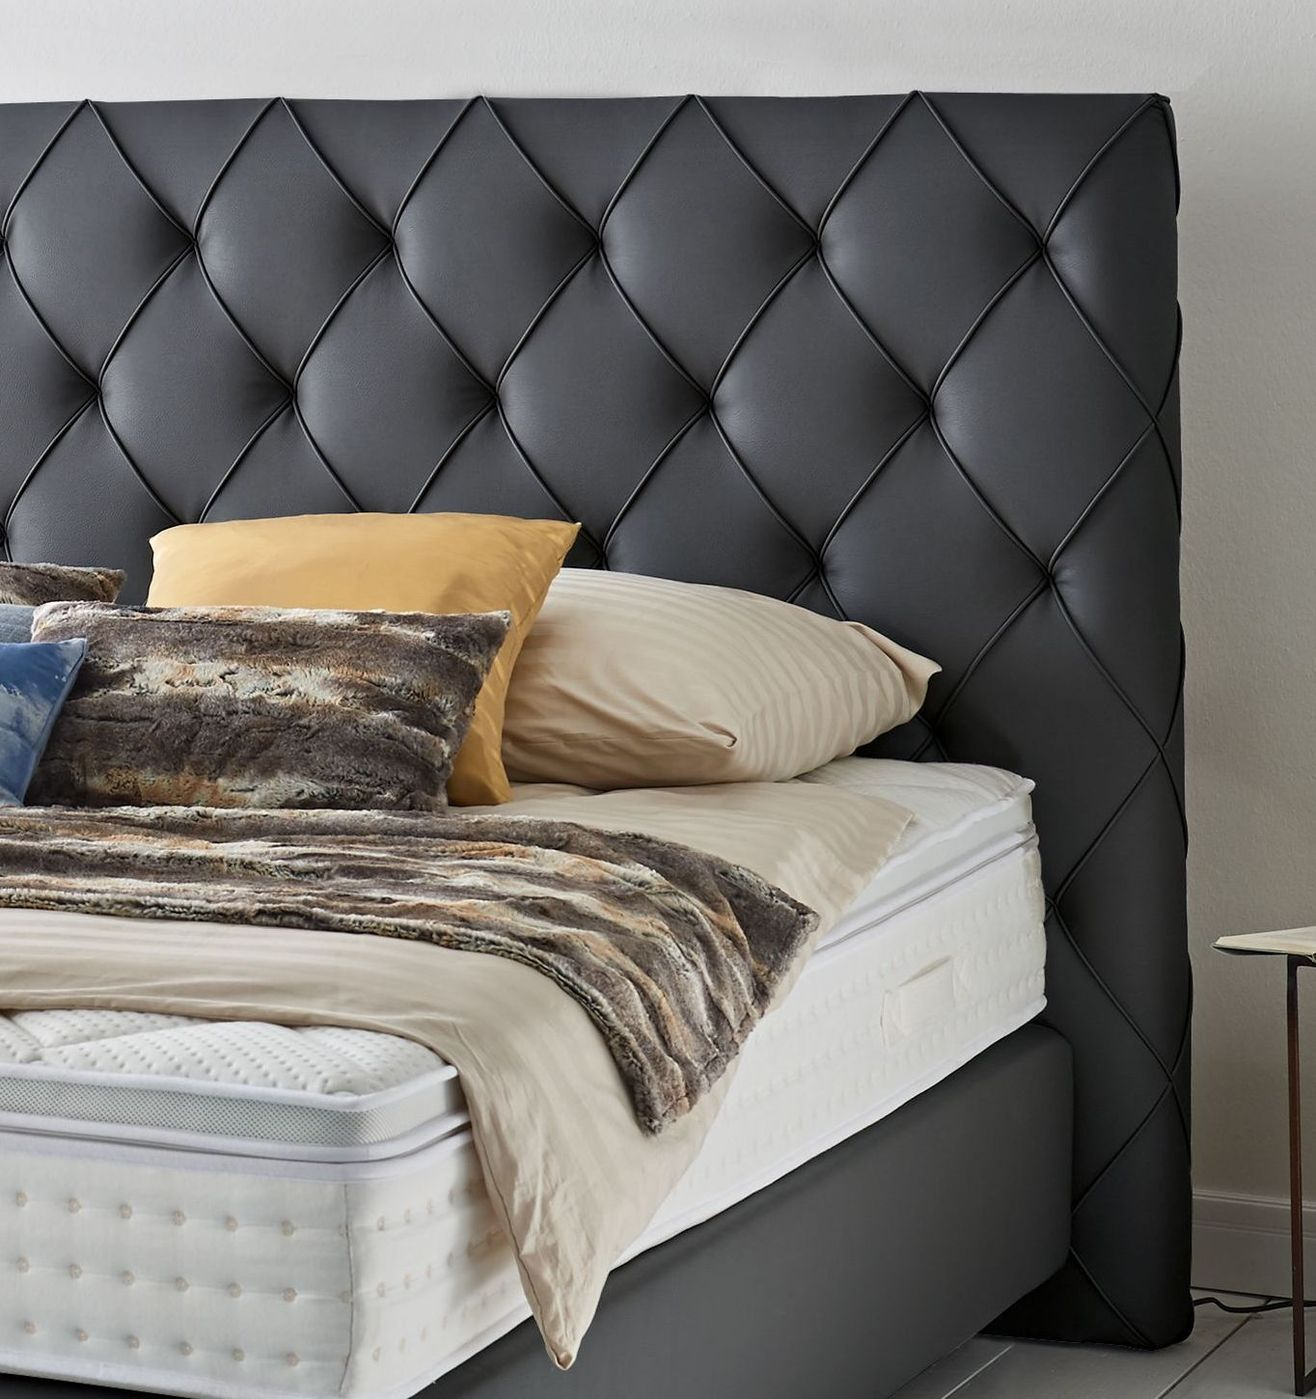 empire select boxspringbett moderner chesterfield look overland. Black Bedroom Furniture Sets. Home Design Ideas